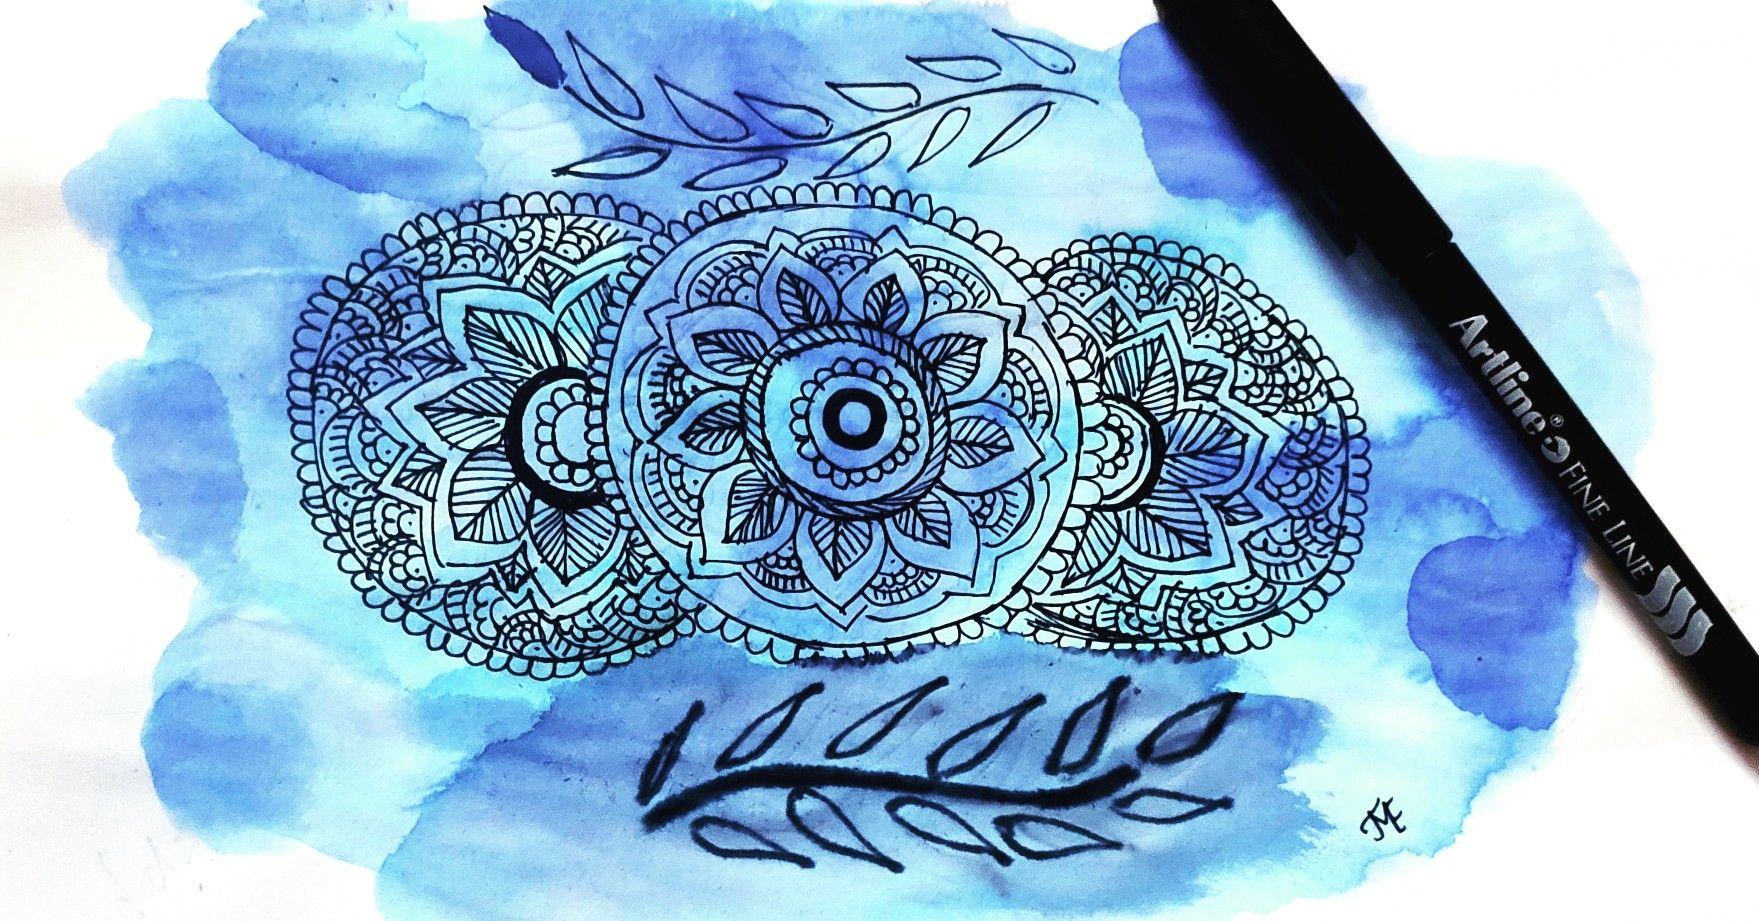 Please do Follow Me on Instagram @ artly_creative_ #artoftheday #artoninstagram #artlycreative #mandala #mandalaart #watercolour #selftaught #creative